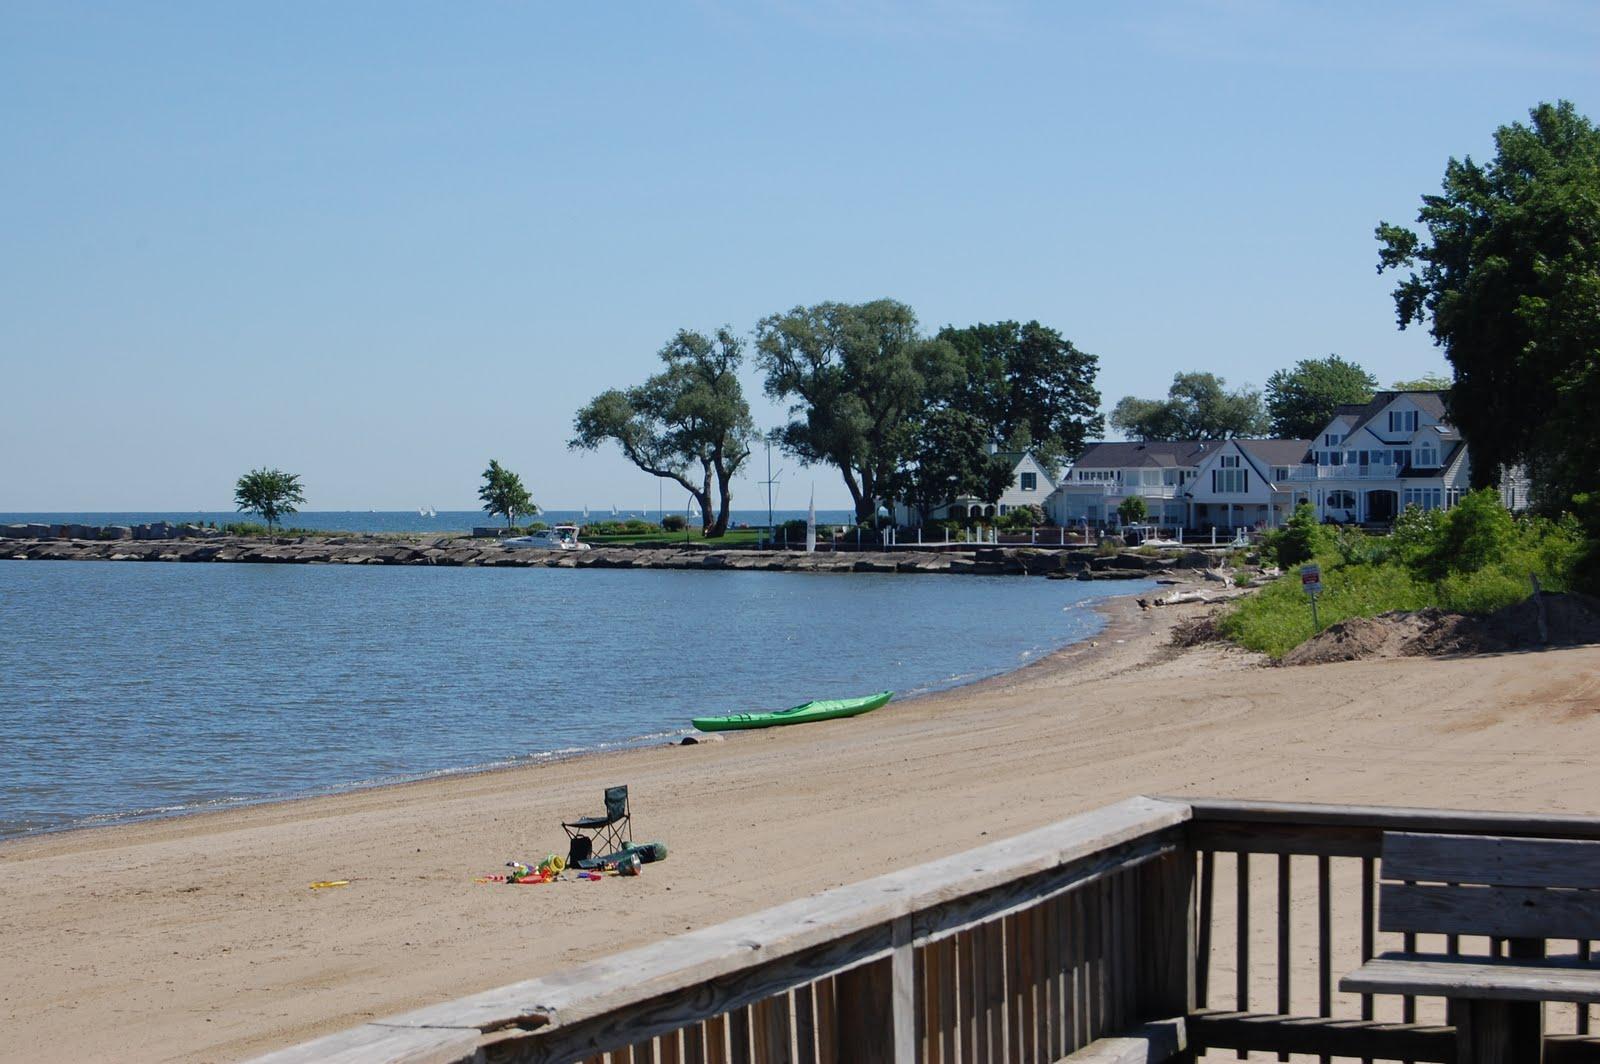 Ohio erie county vermilion - Vermilion Ohio A Beautiful Lakefront And Riverfront Community